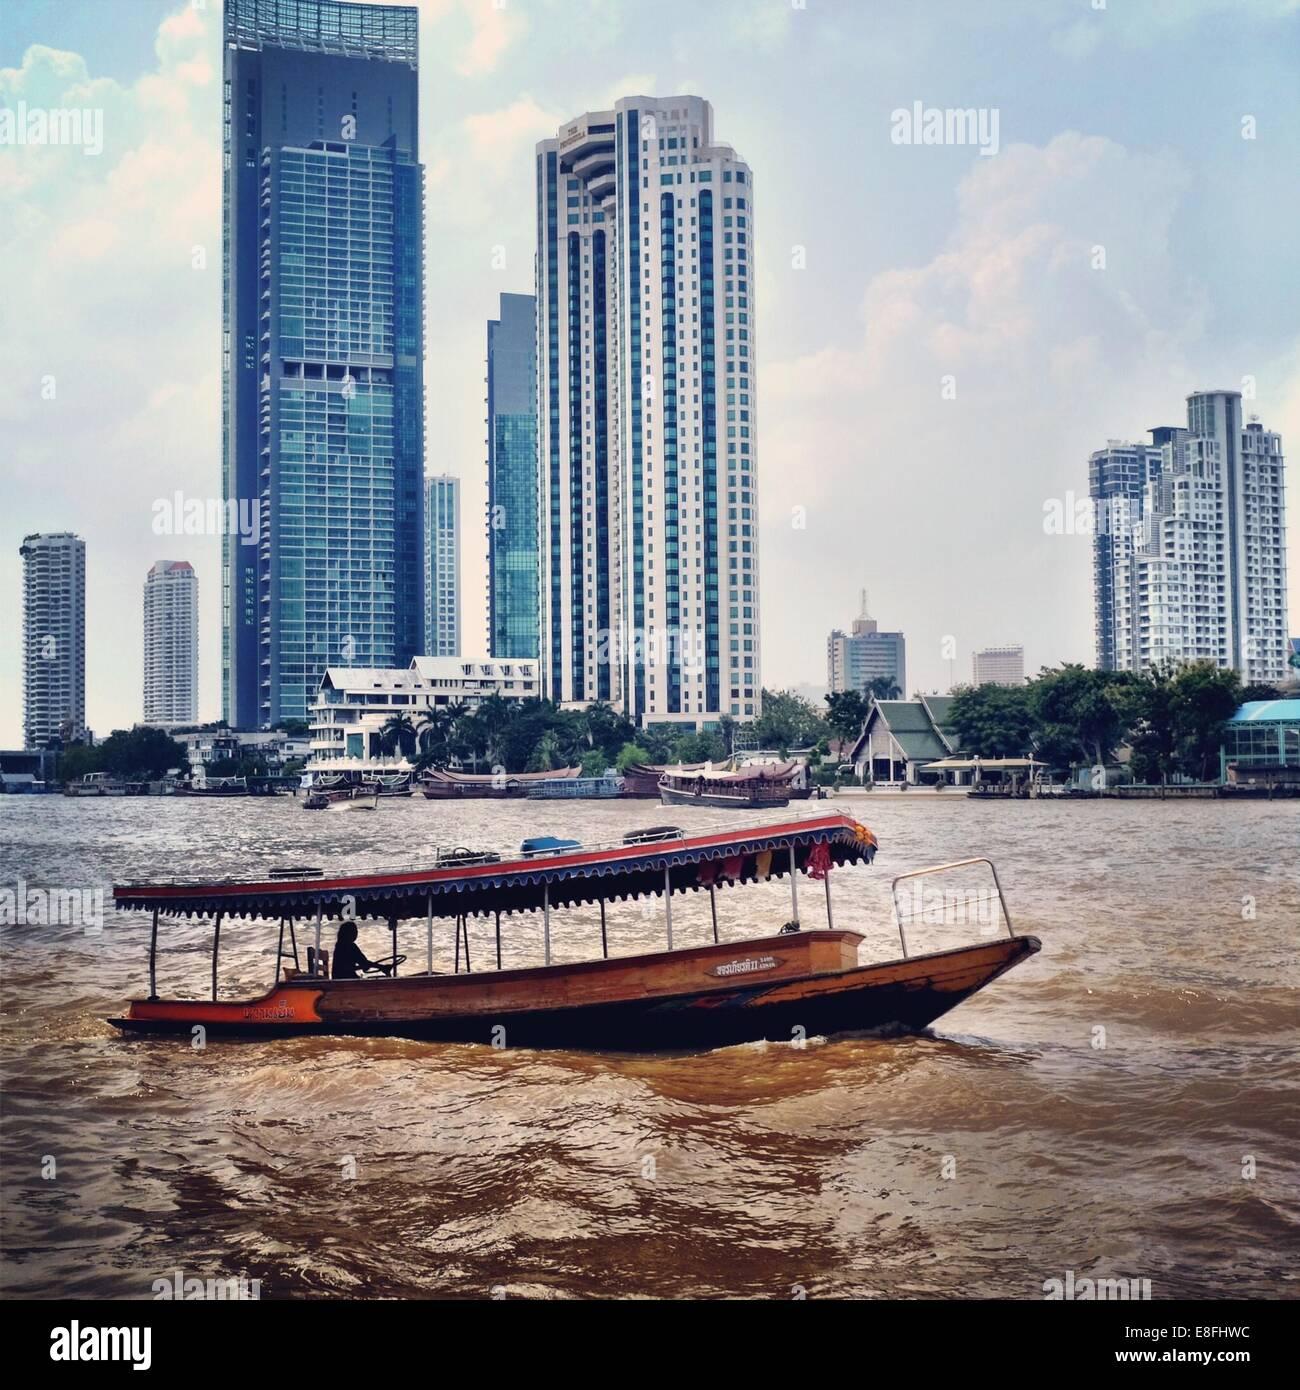 Thailand, Bangkok, River boat and cityscape - Stock Image